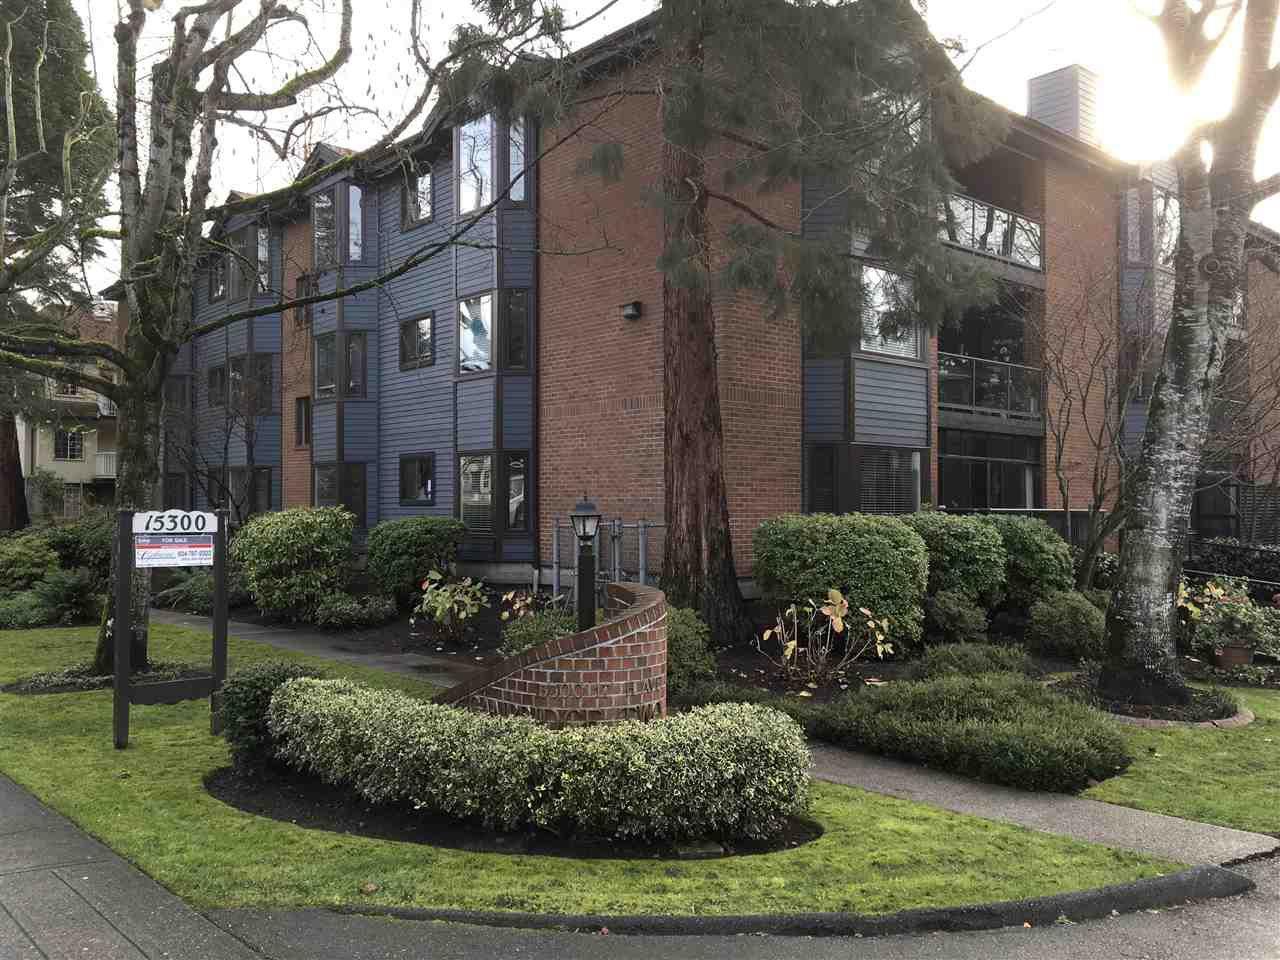 "Main Photo: 105 15300 17 Avenue in Surrey: King George Corridor Condo for sale in ""The Cambridge"" (South Surrey White Rock)  : MLS®# R2124370"